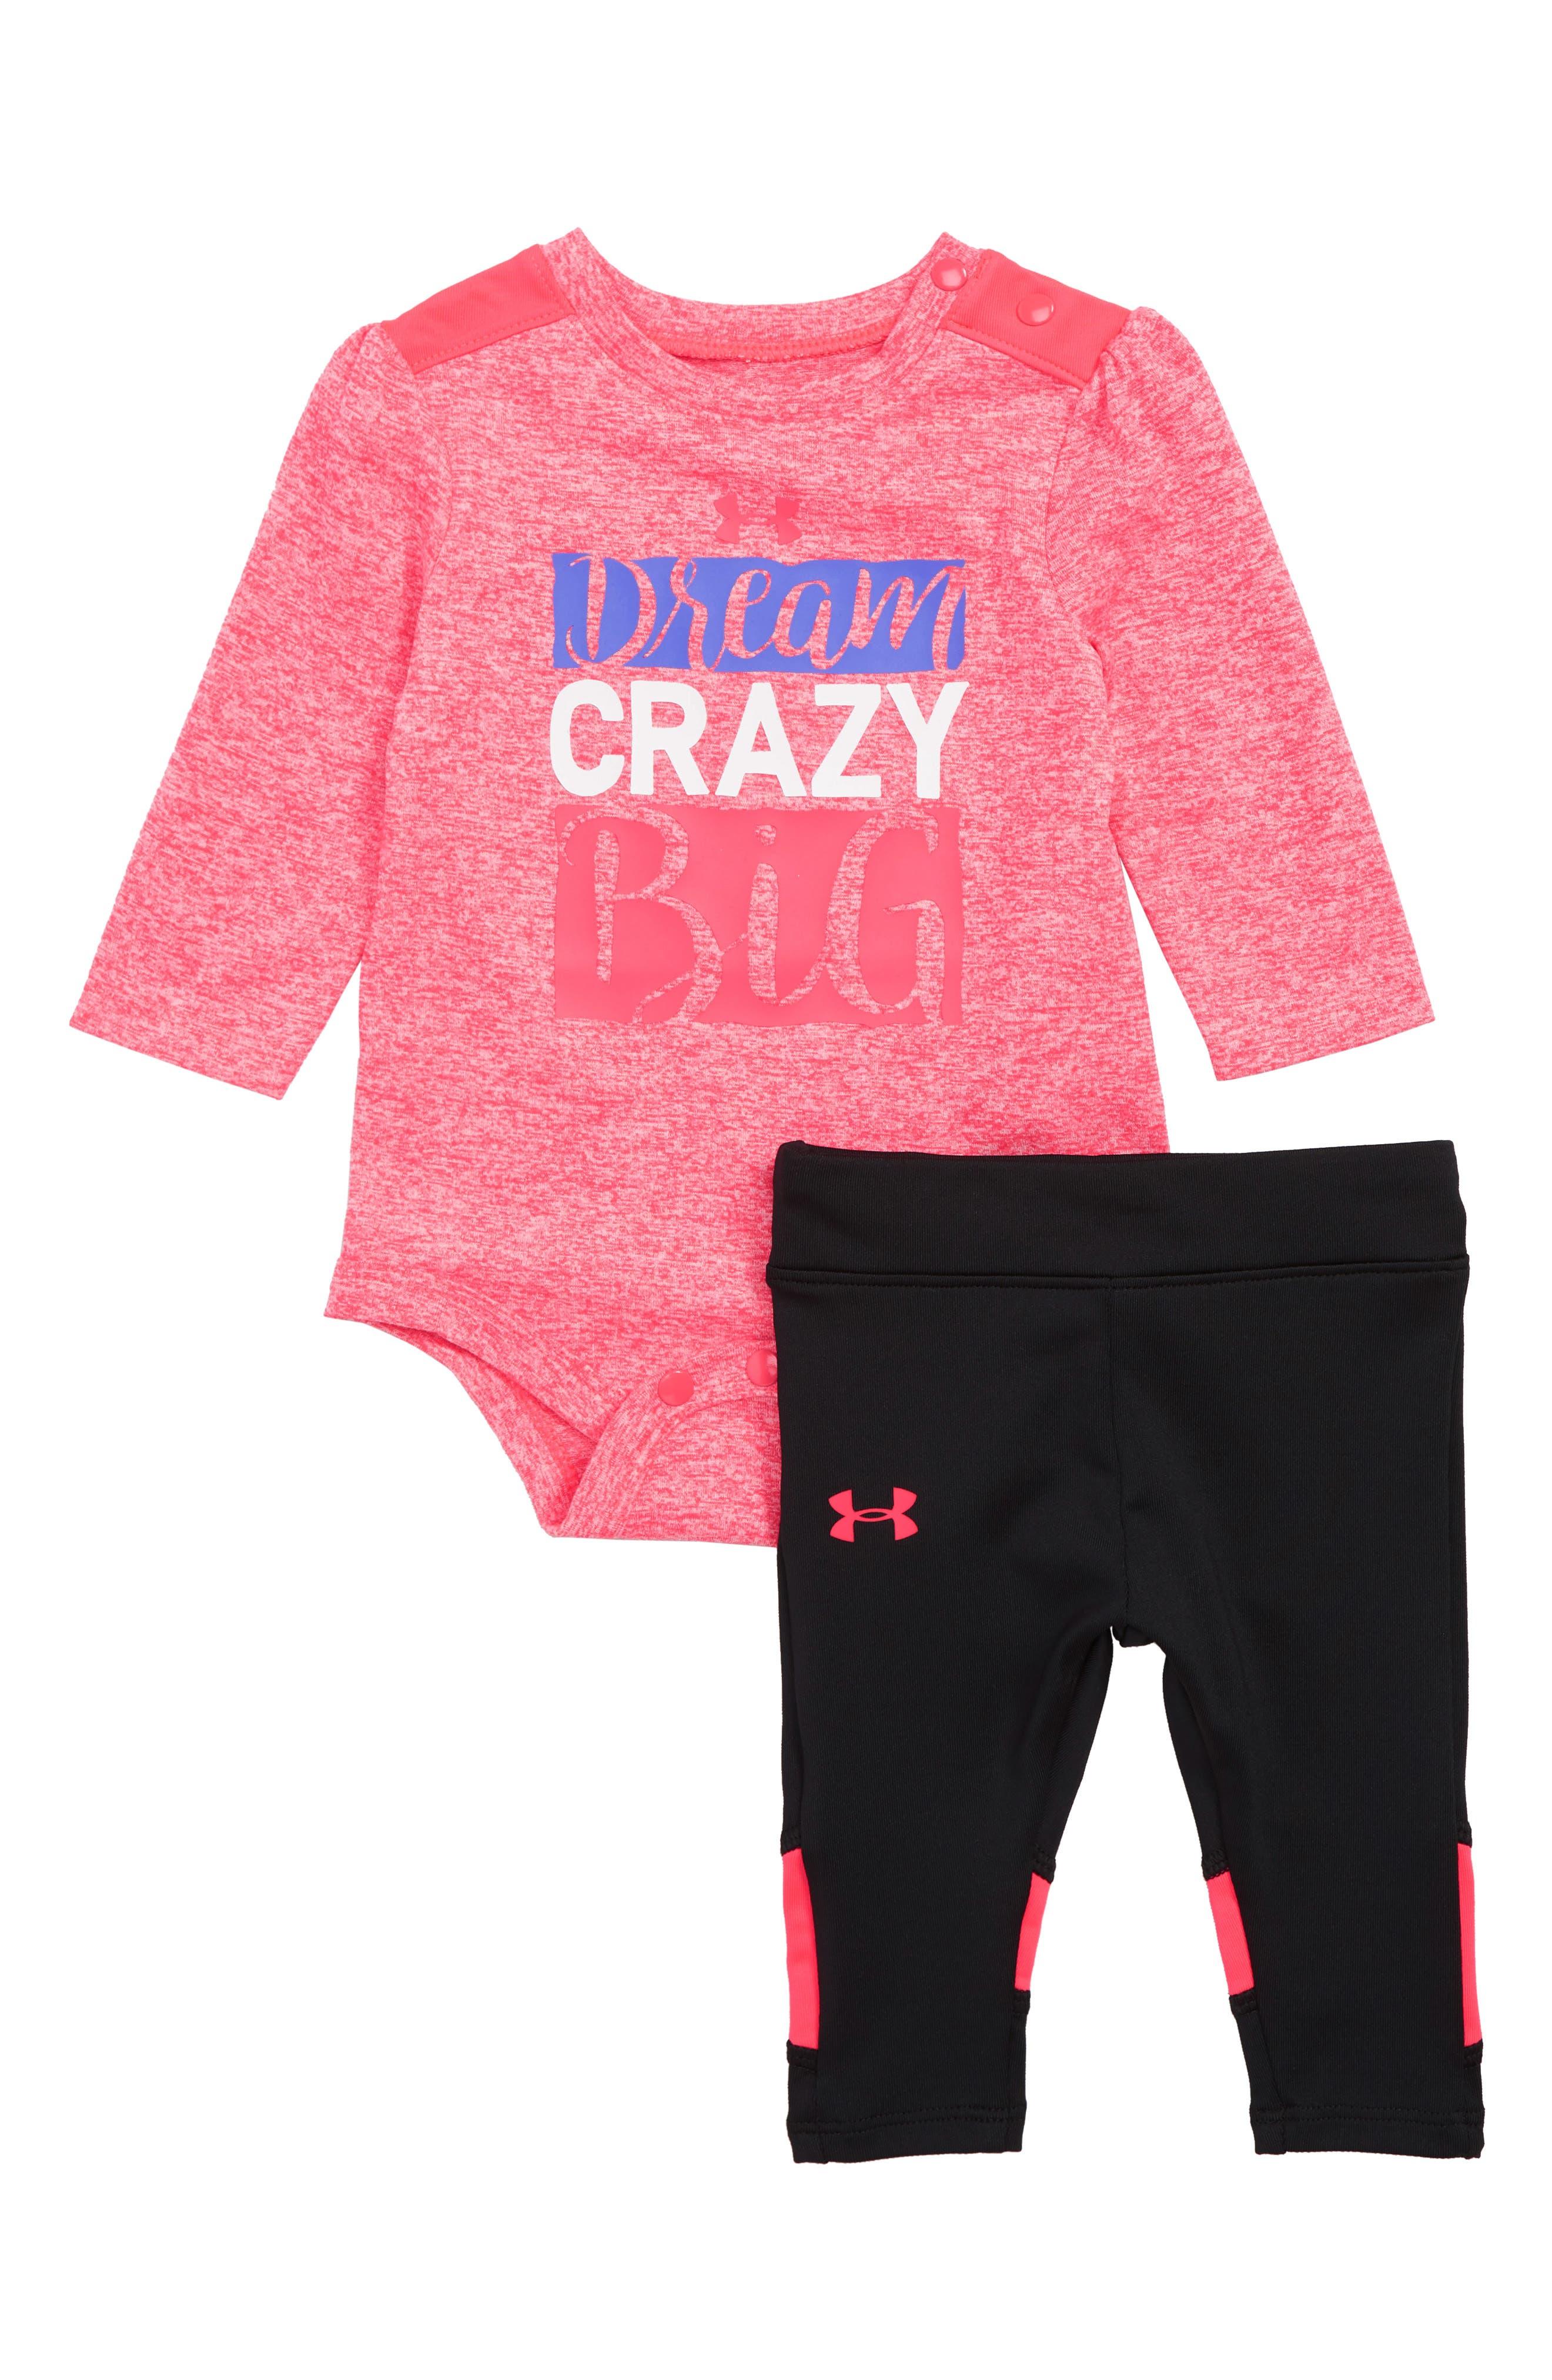 Infant Girls Under Armour Dream Crazy Big Bodysuit  Leggings Set